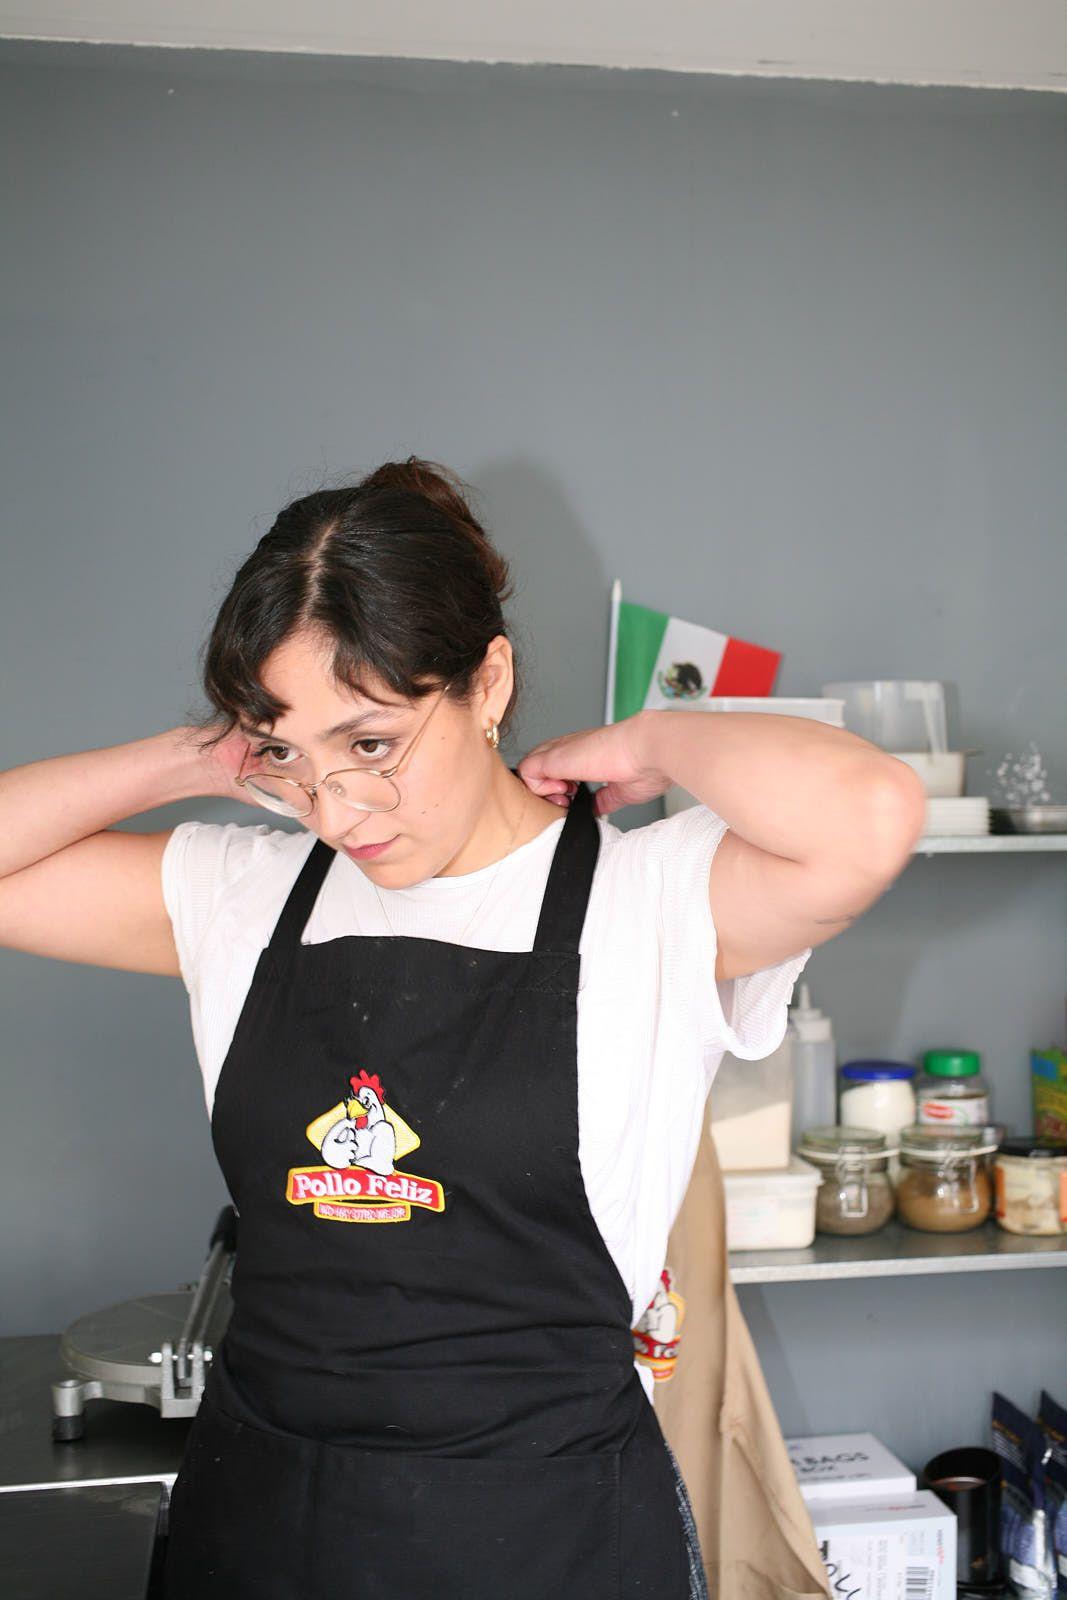 Michelle Salazar de la Rocha of Sonora Taqueria wearing a Pollo Feliz apron last year